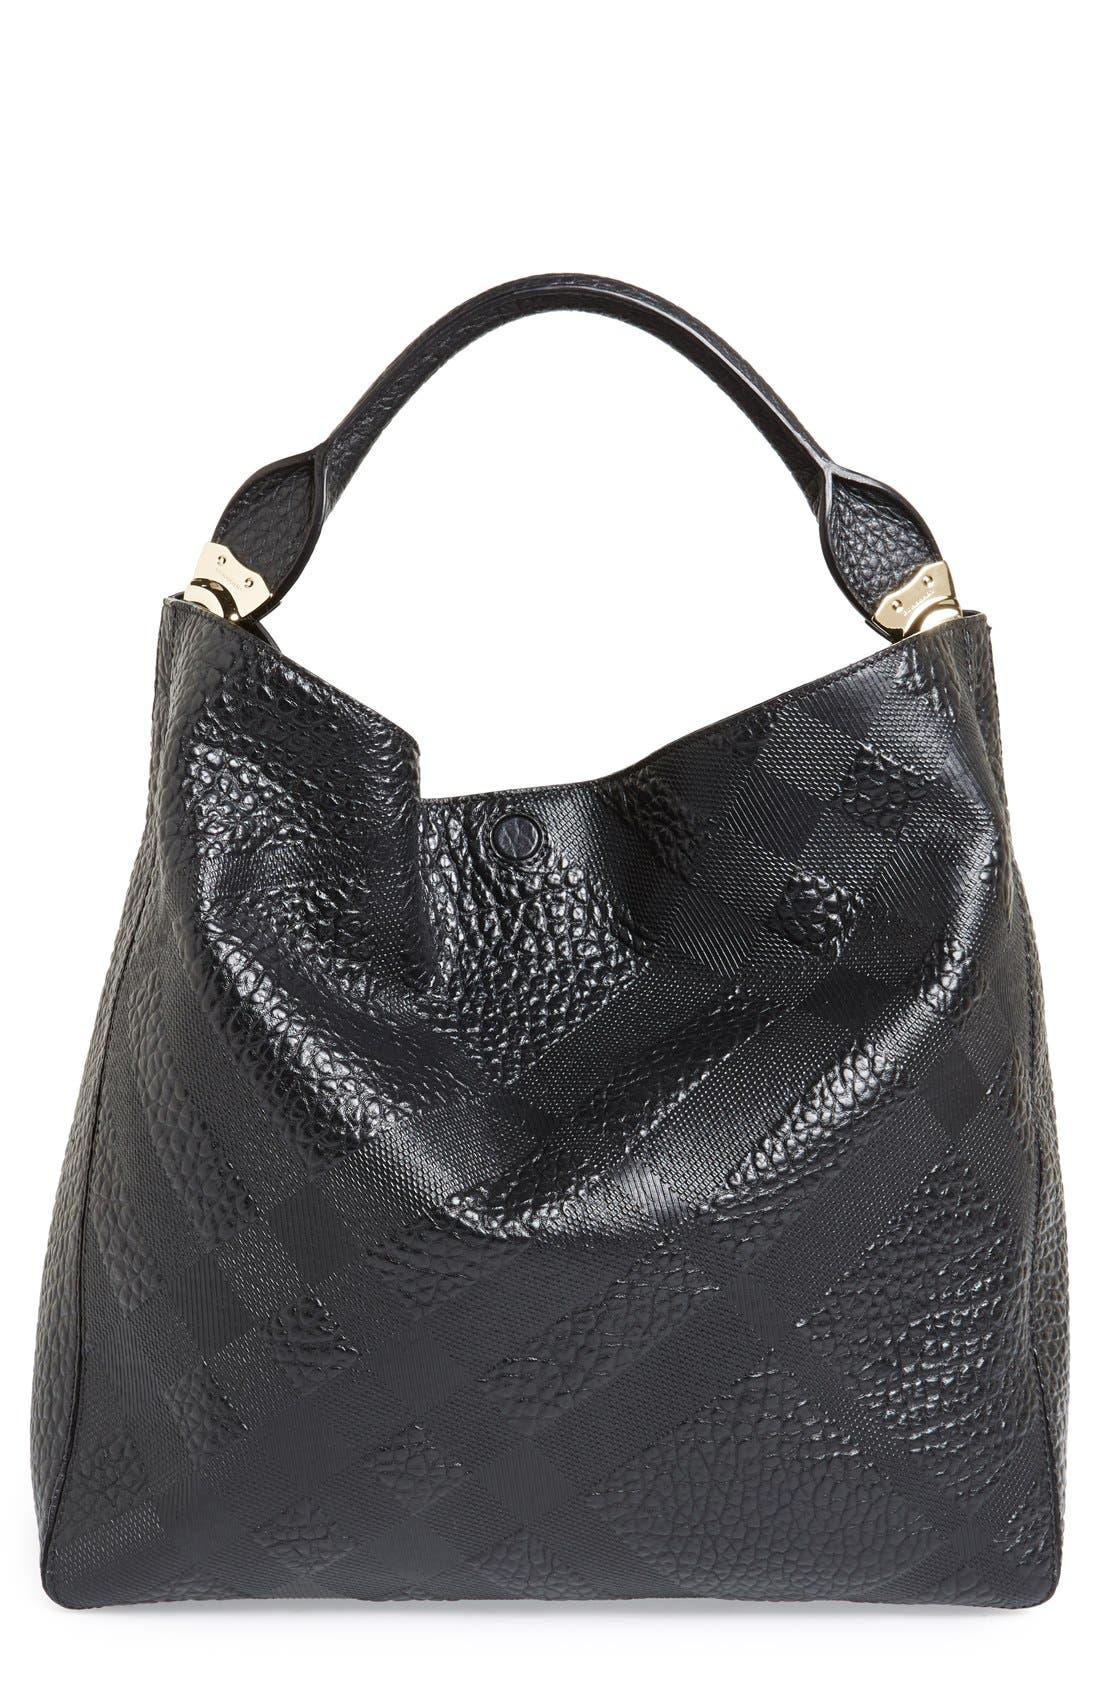 Main Image - Burberry 'Medium Lindburn' Check Embossed Leather Hobo